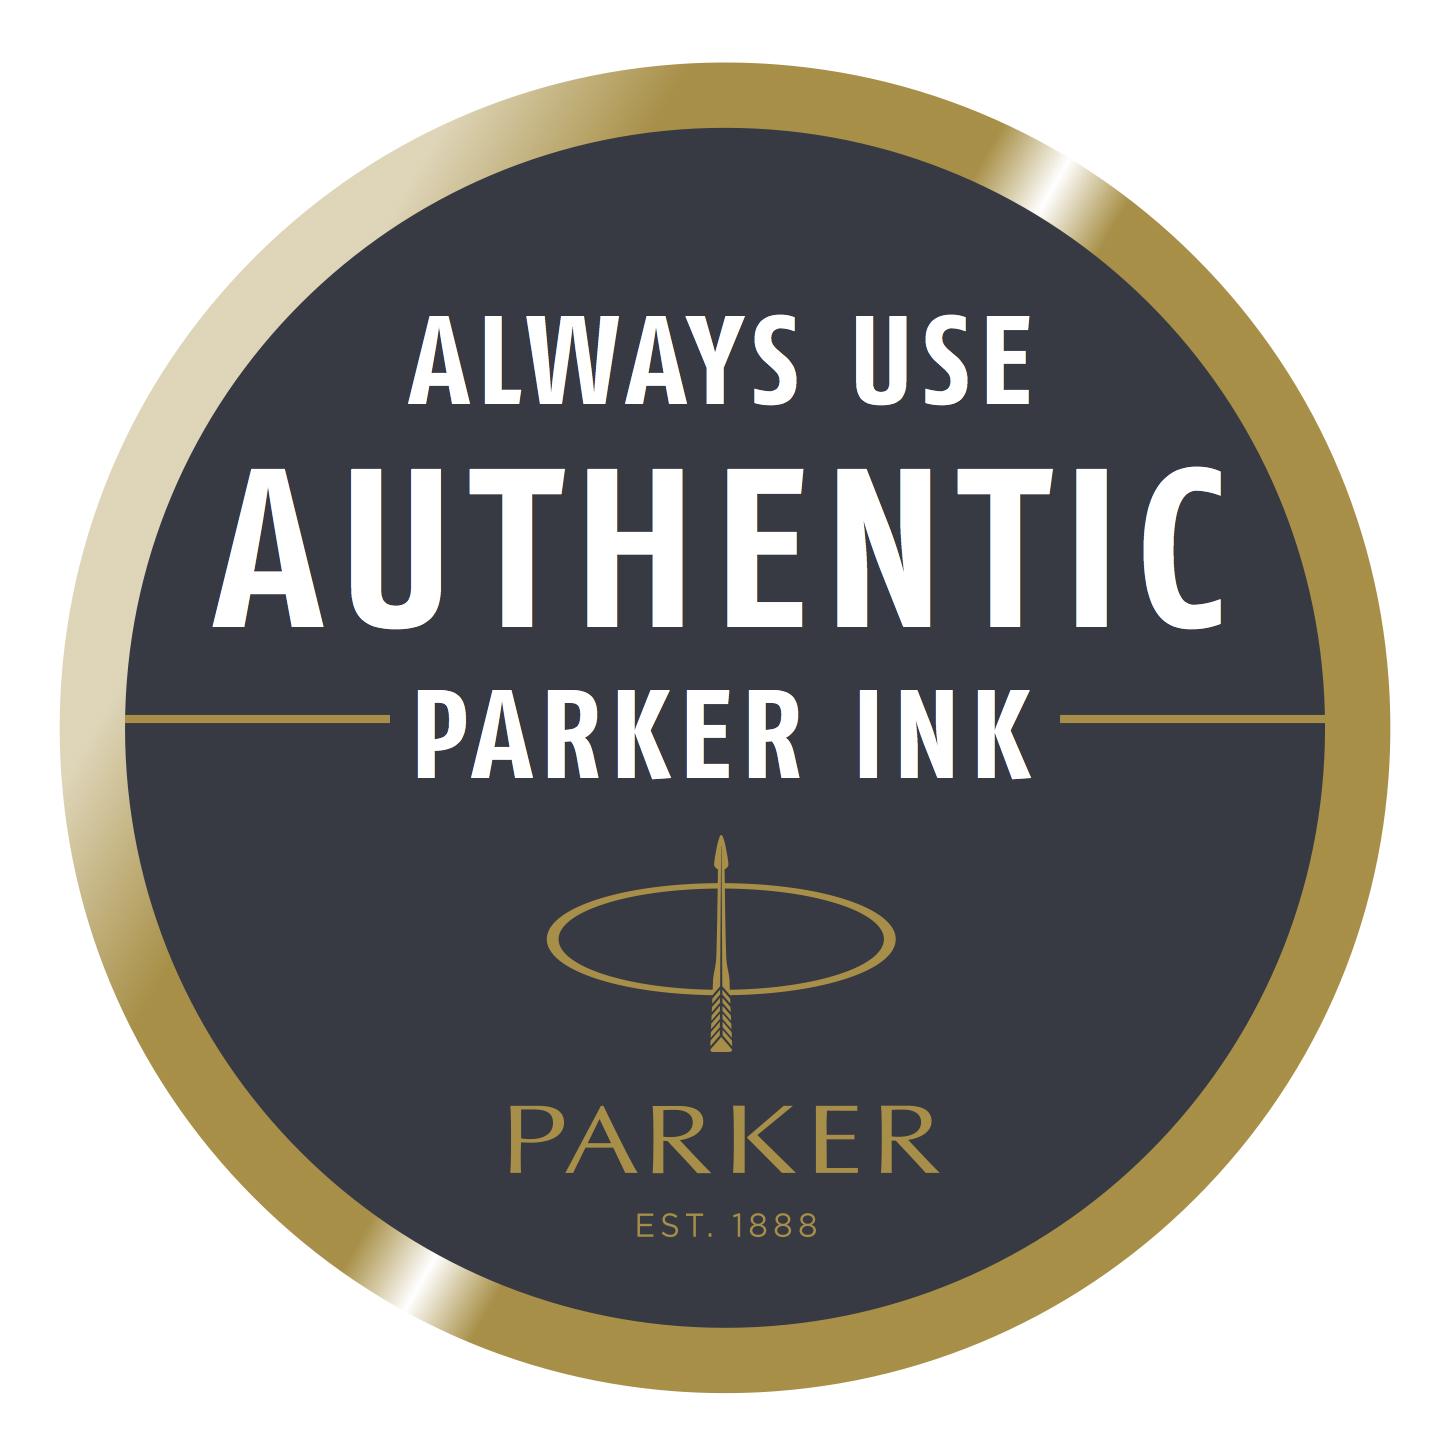 Parker_Authentic_Ink.png